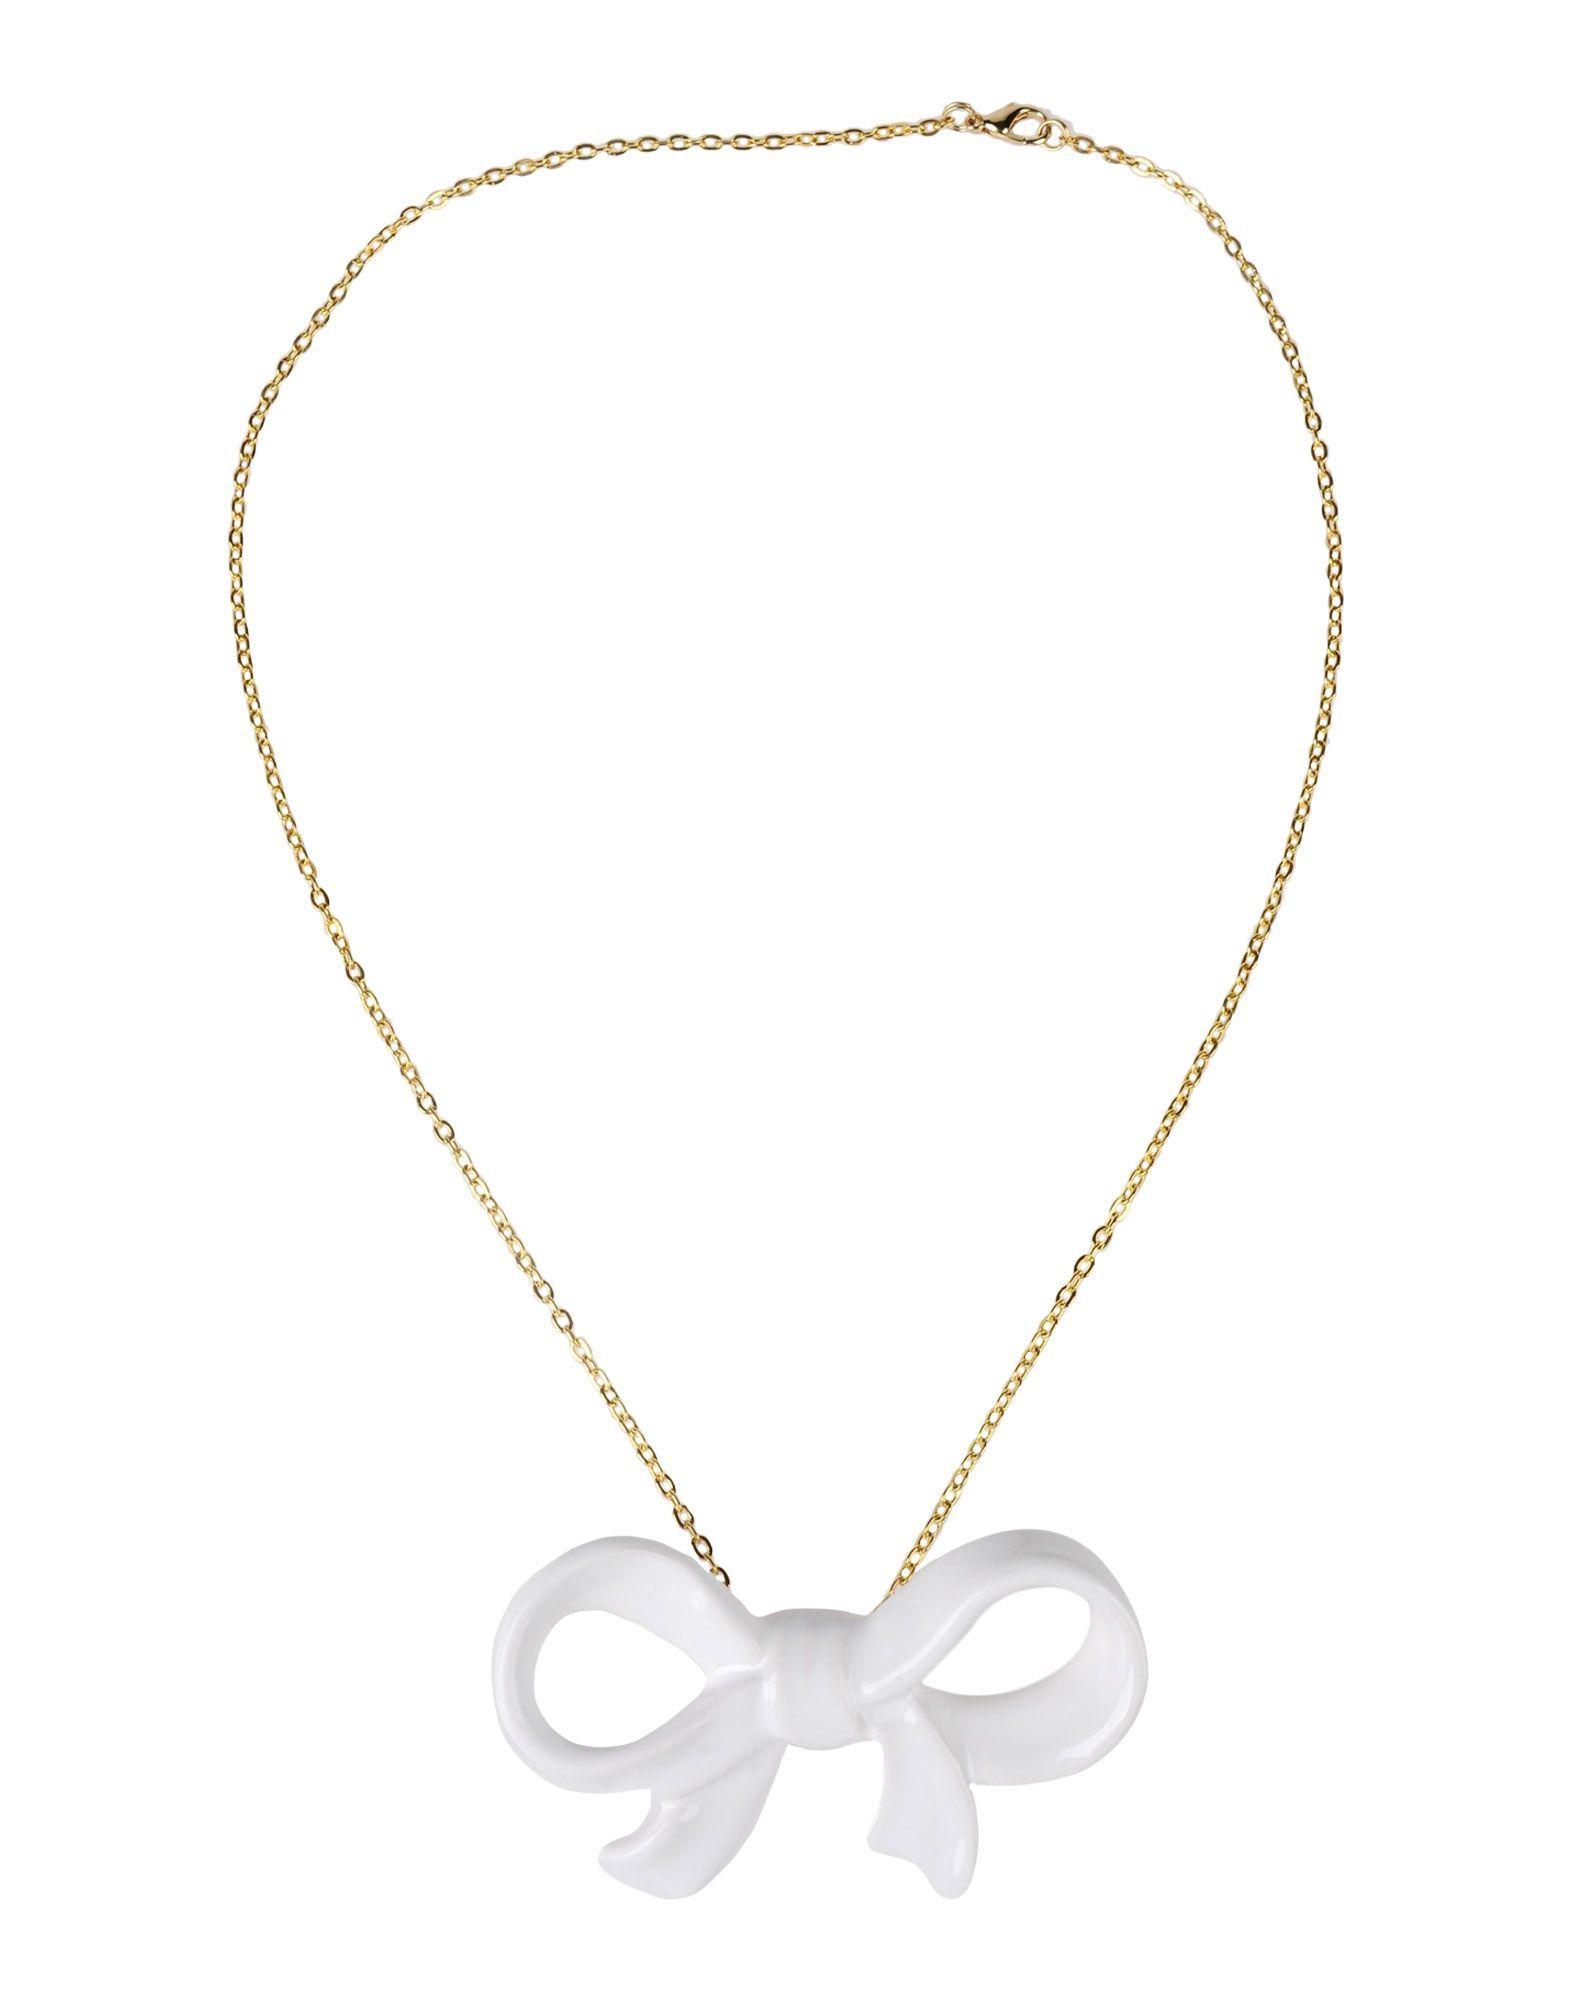 Cor Sine Labe Doli White Ceramic Bow Necklace